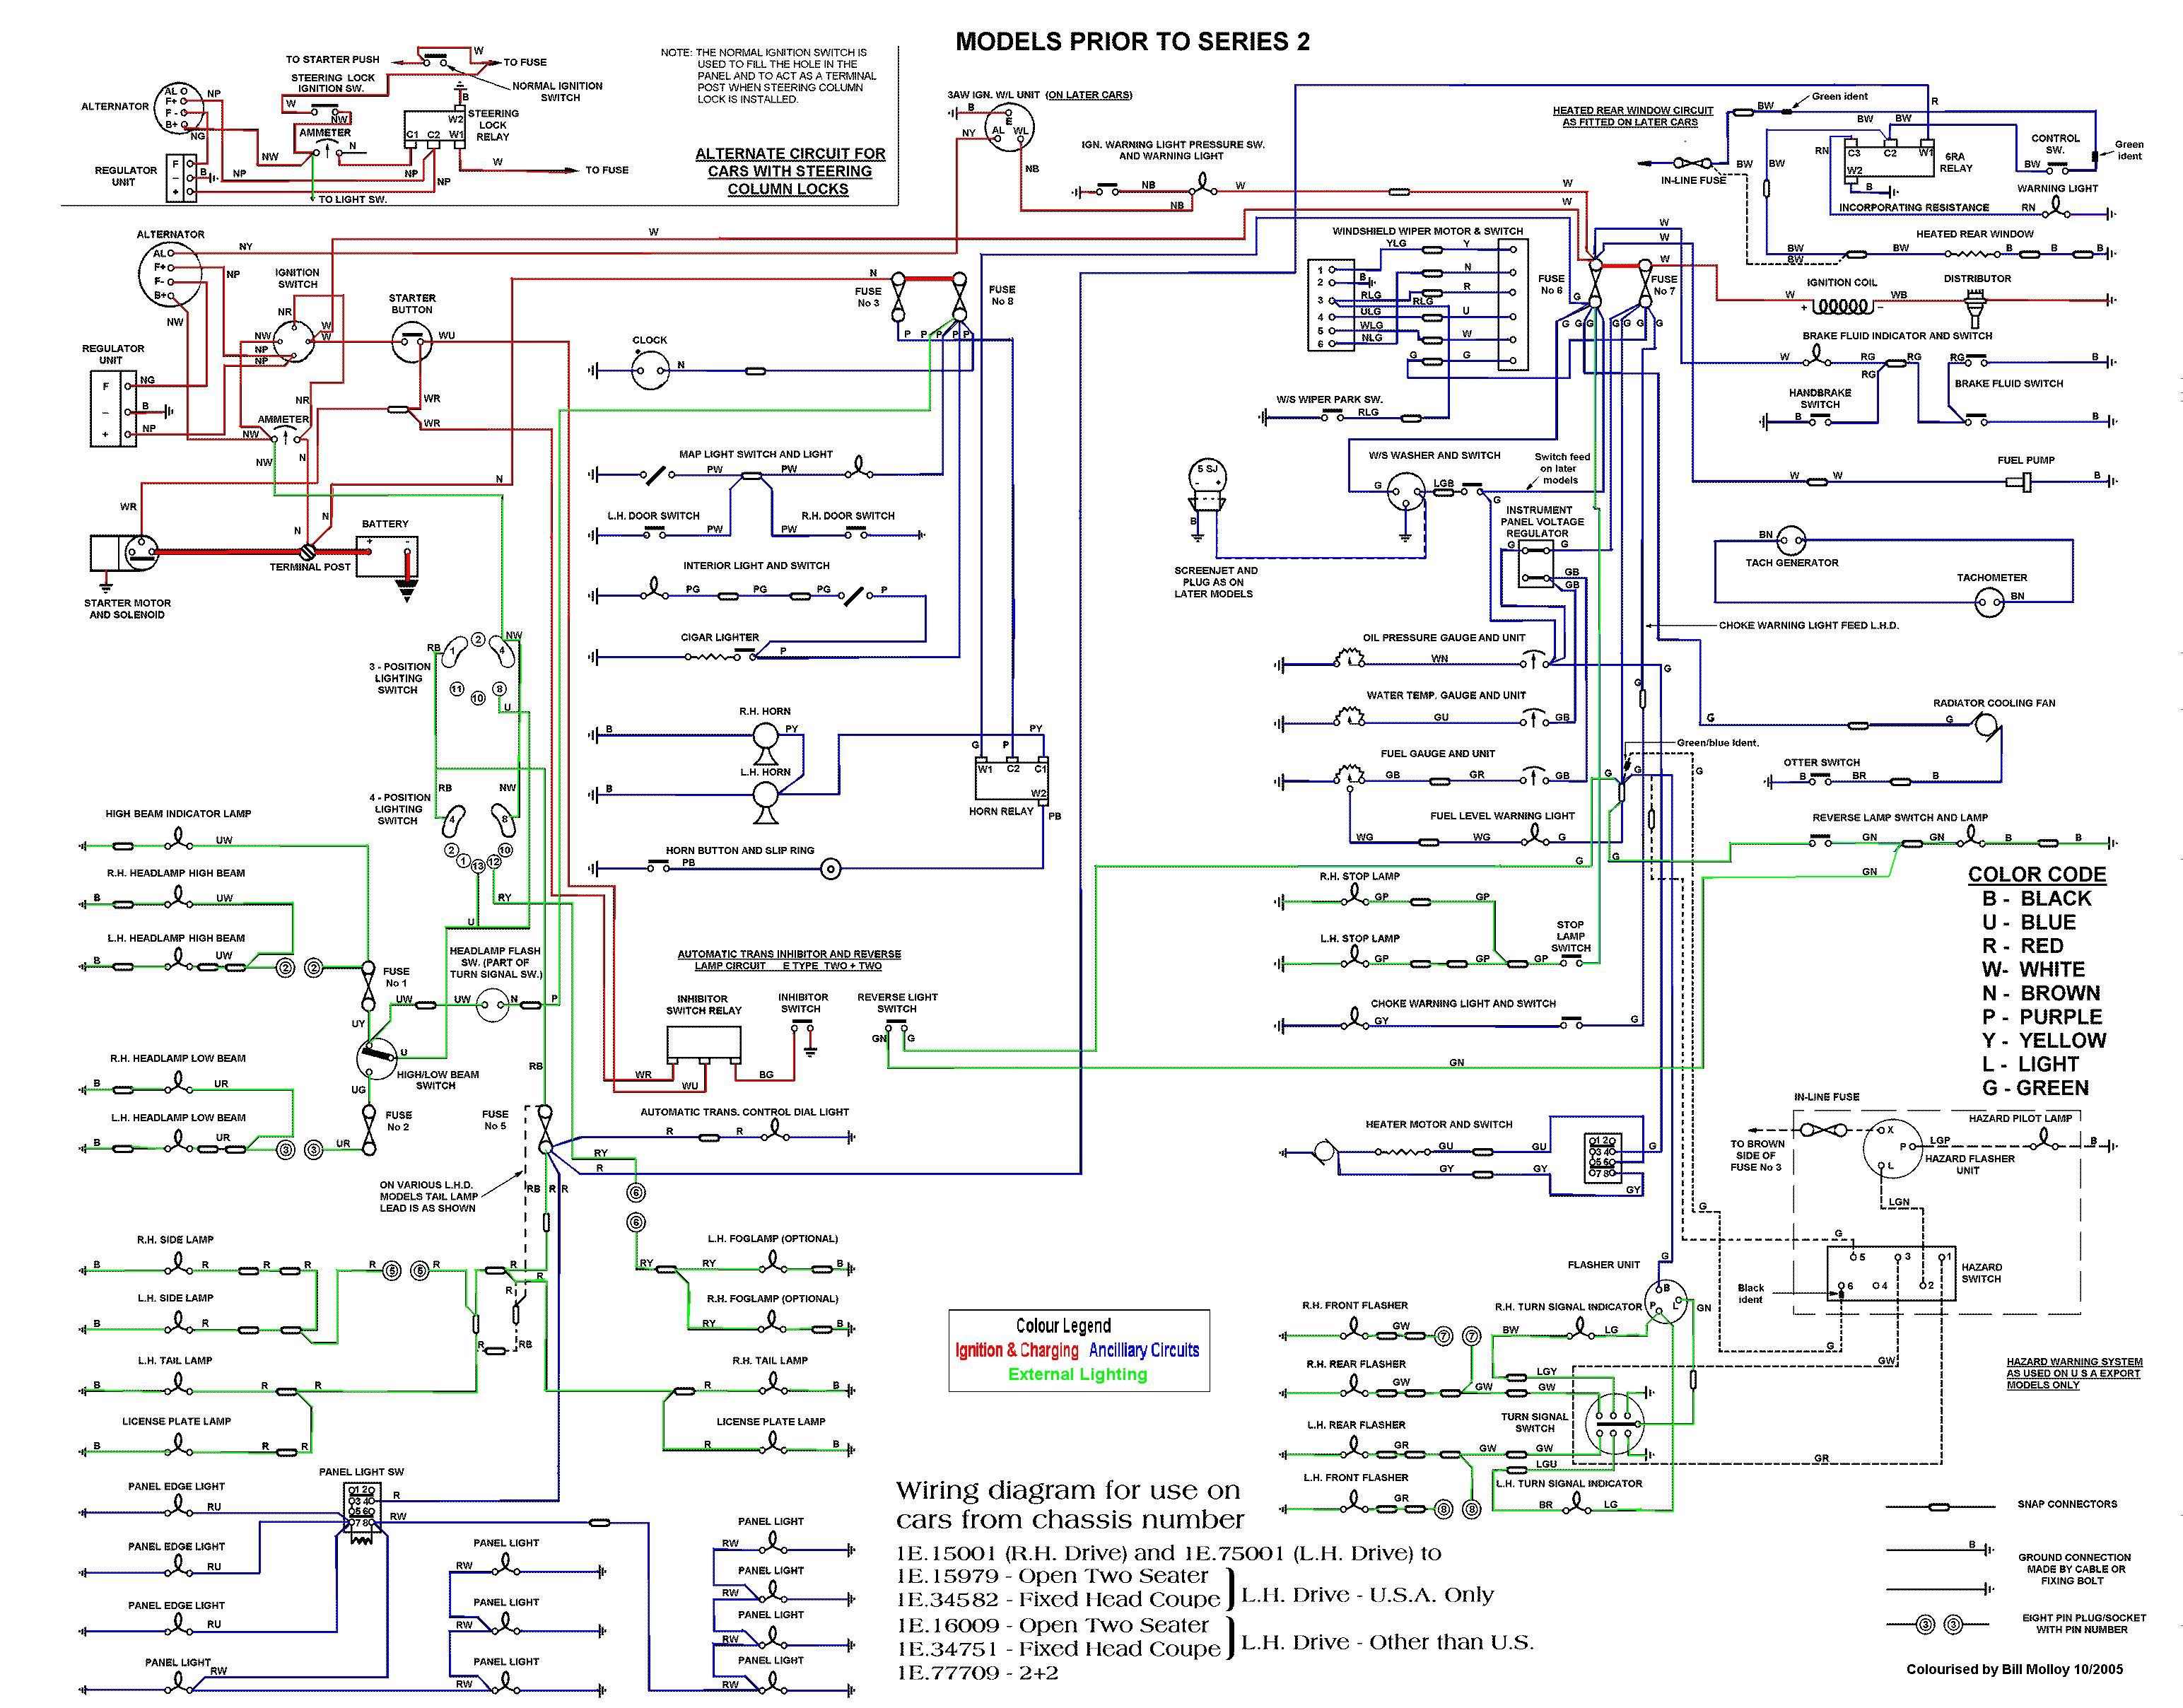 Fender Jaguar Hh Wiring Harness Diagrams Data Base Squier Strat Diagram Vintage Modified Electric Guitar Rh Cdn Myscu Pro On Classic For